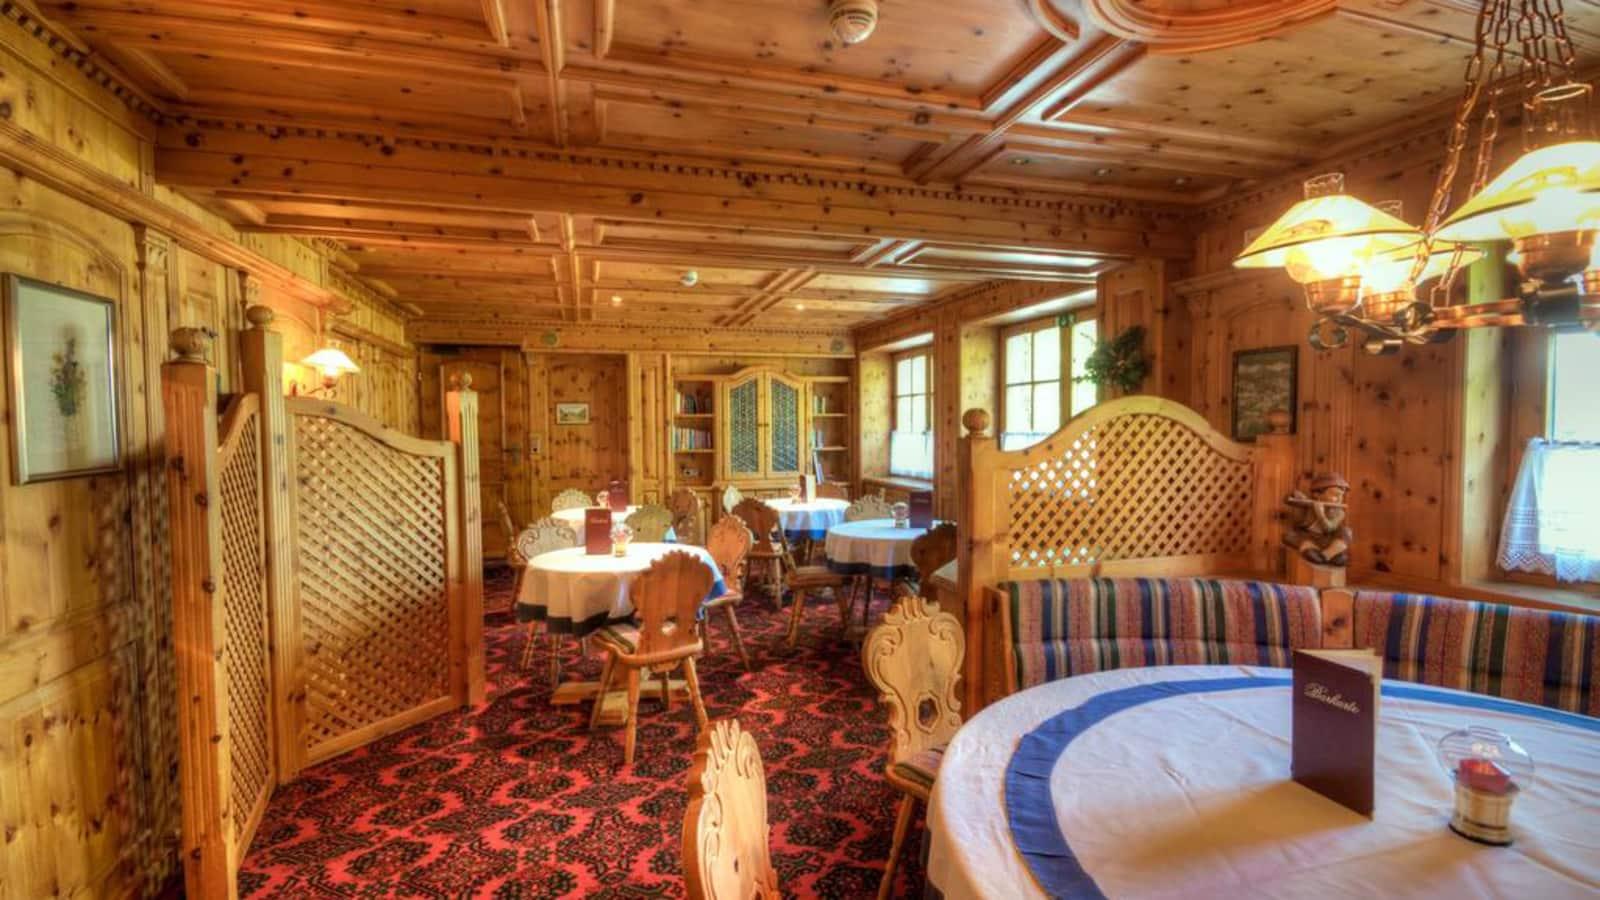 Hotel Alpina, Bad Hofgastein, Austria - Cheap Ski Holidays 2017 2018